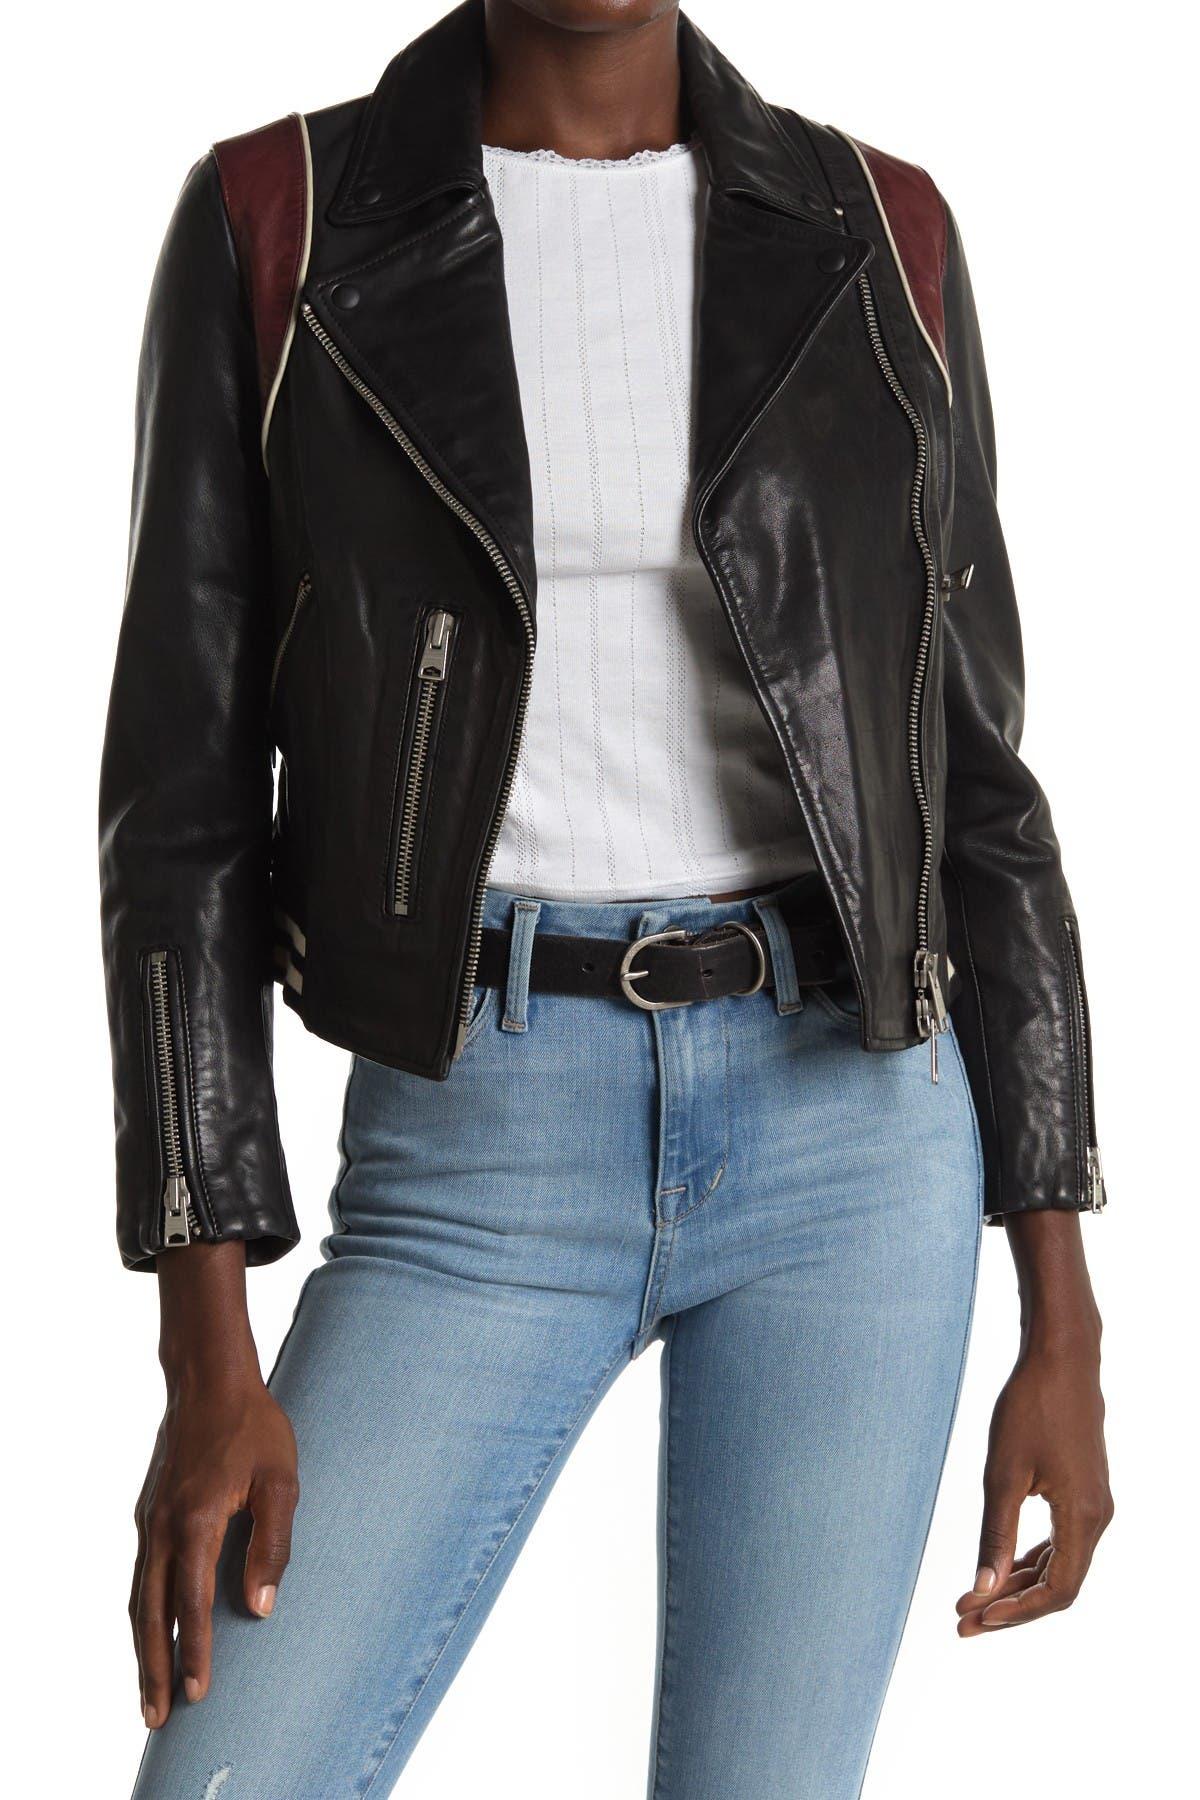 Image of ALLSAINTS Balfern Leather Jacket